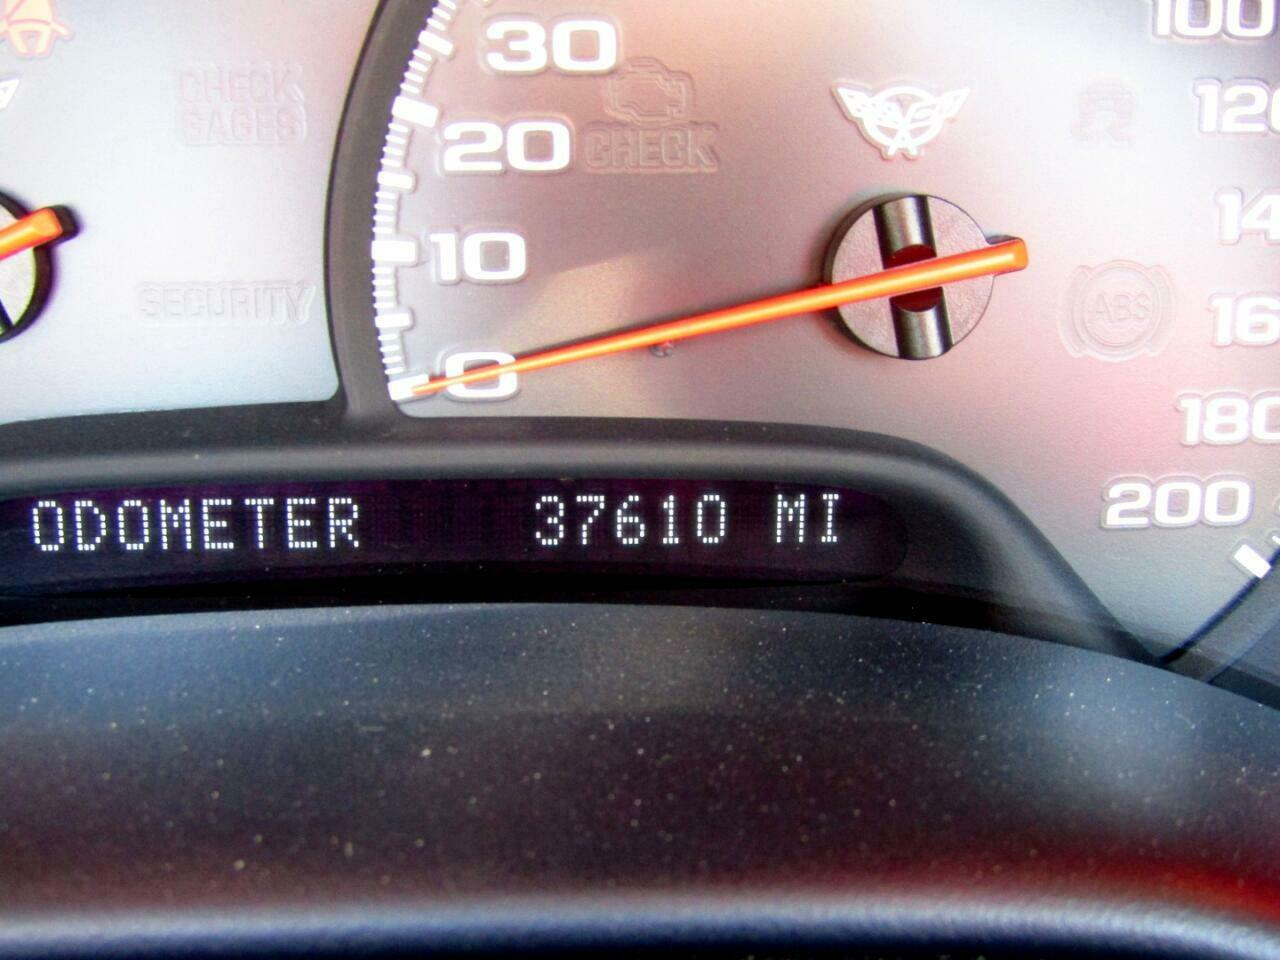 2004 Red Chevrolet Corvette Convertible  | C5 Corvette Photo 4